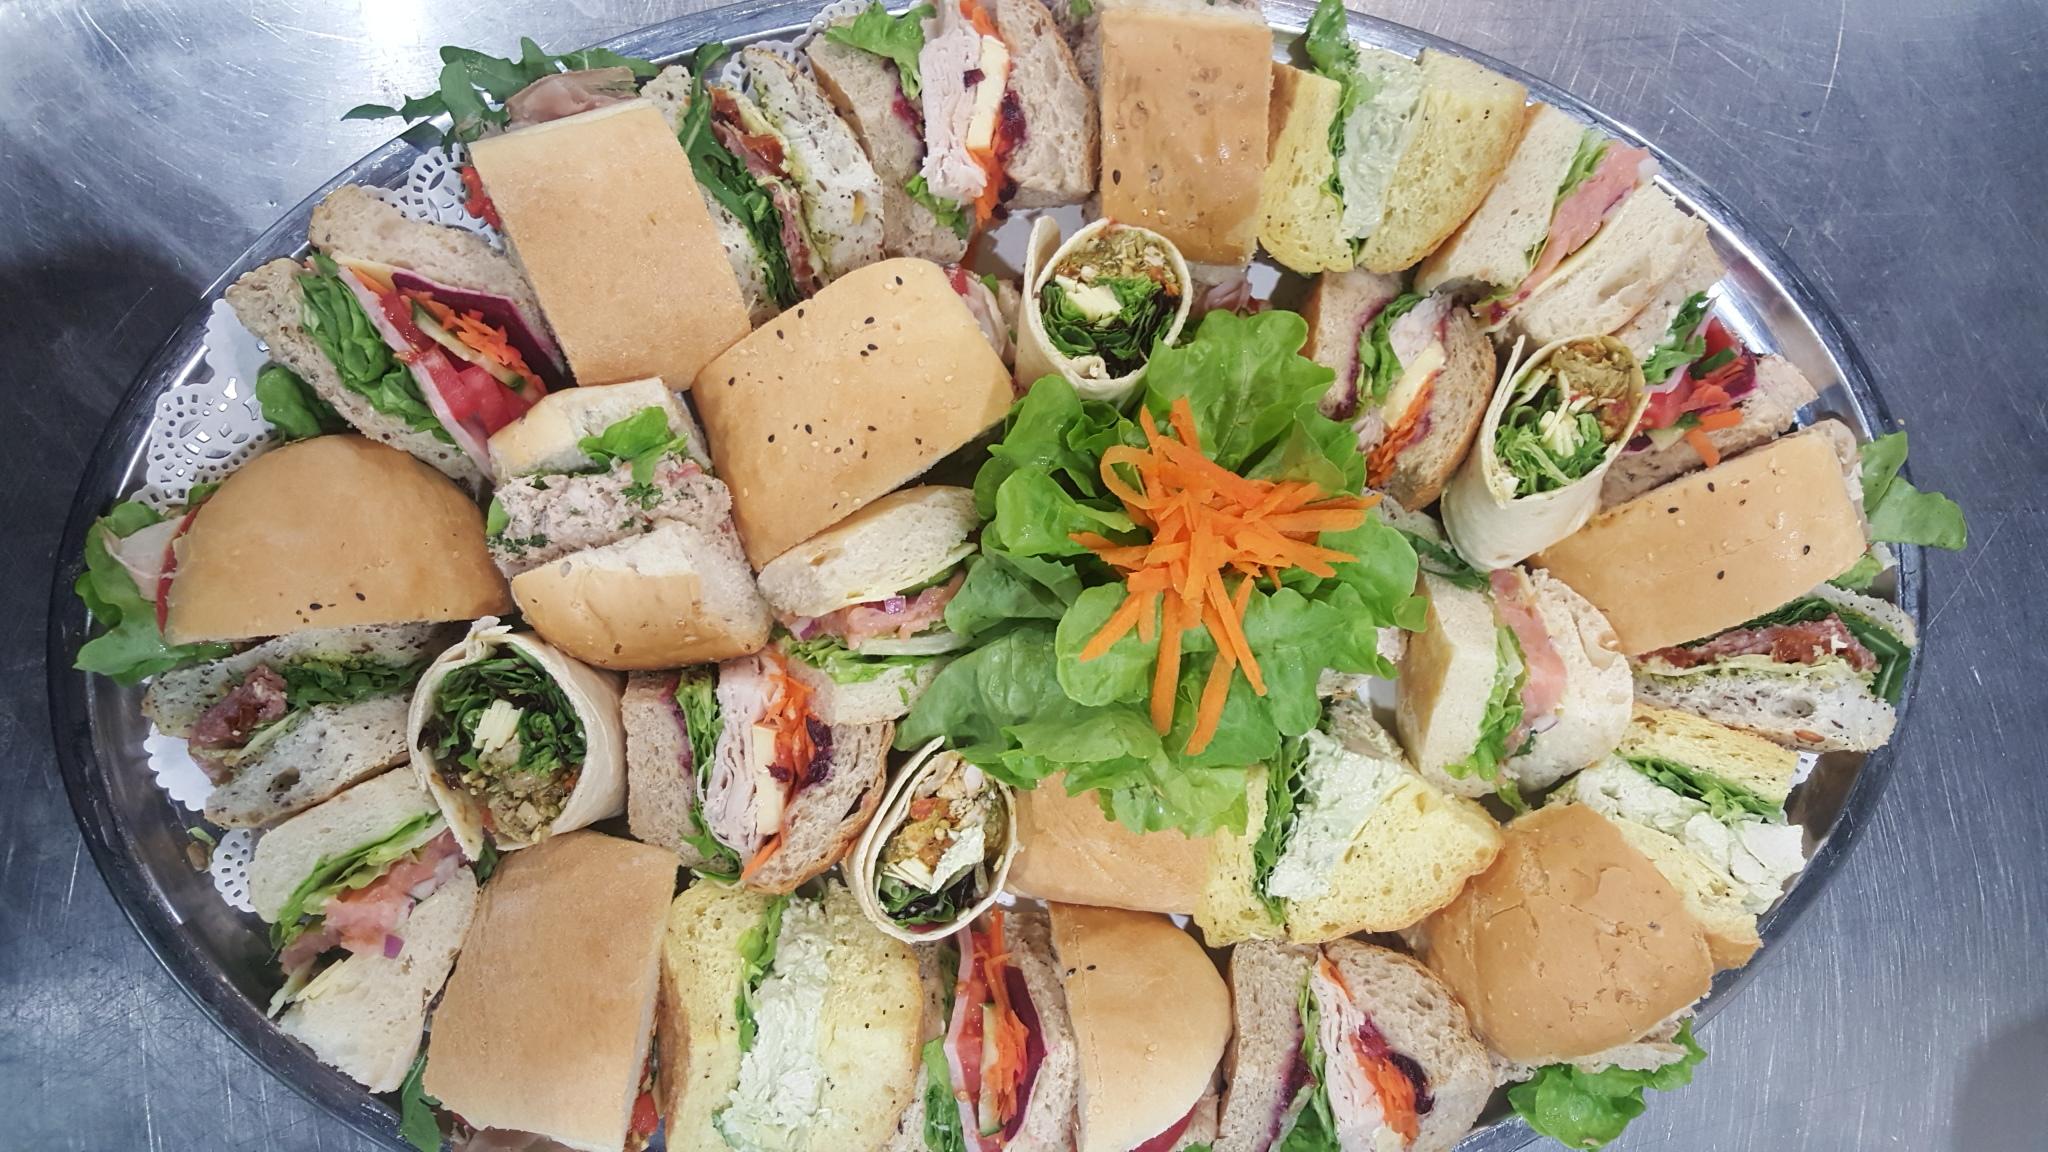 Rolls, Wraps & Sandwiches Platter